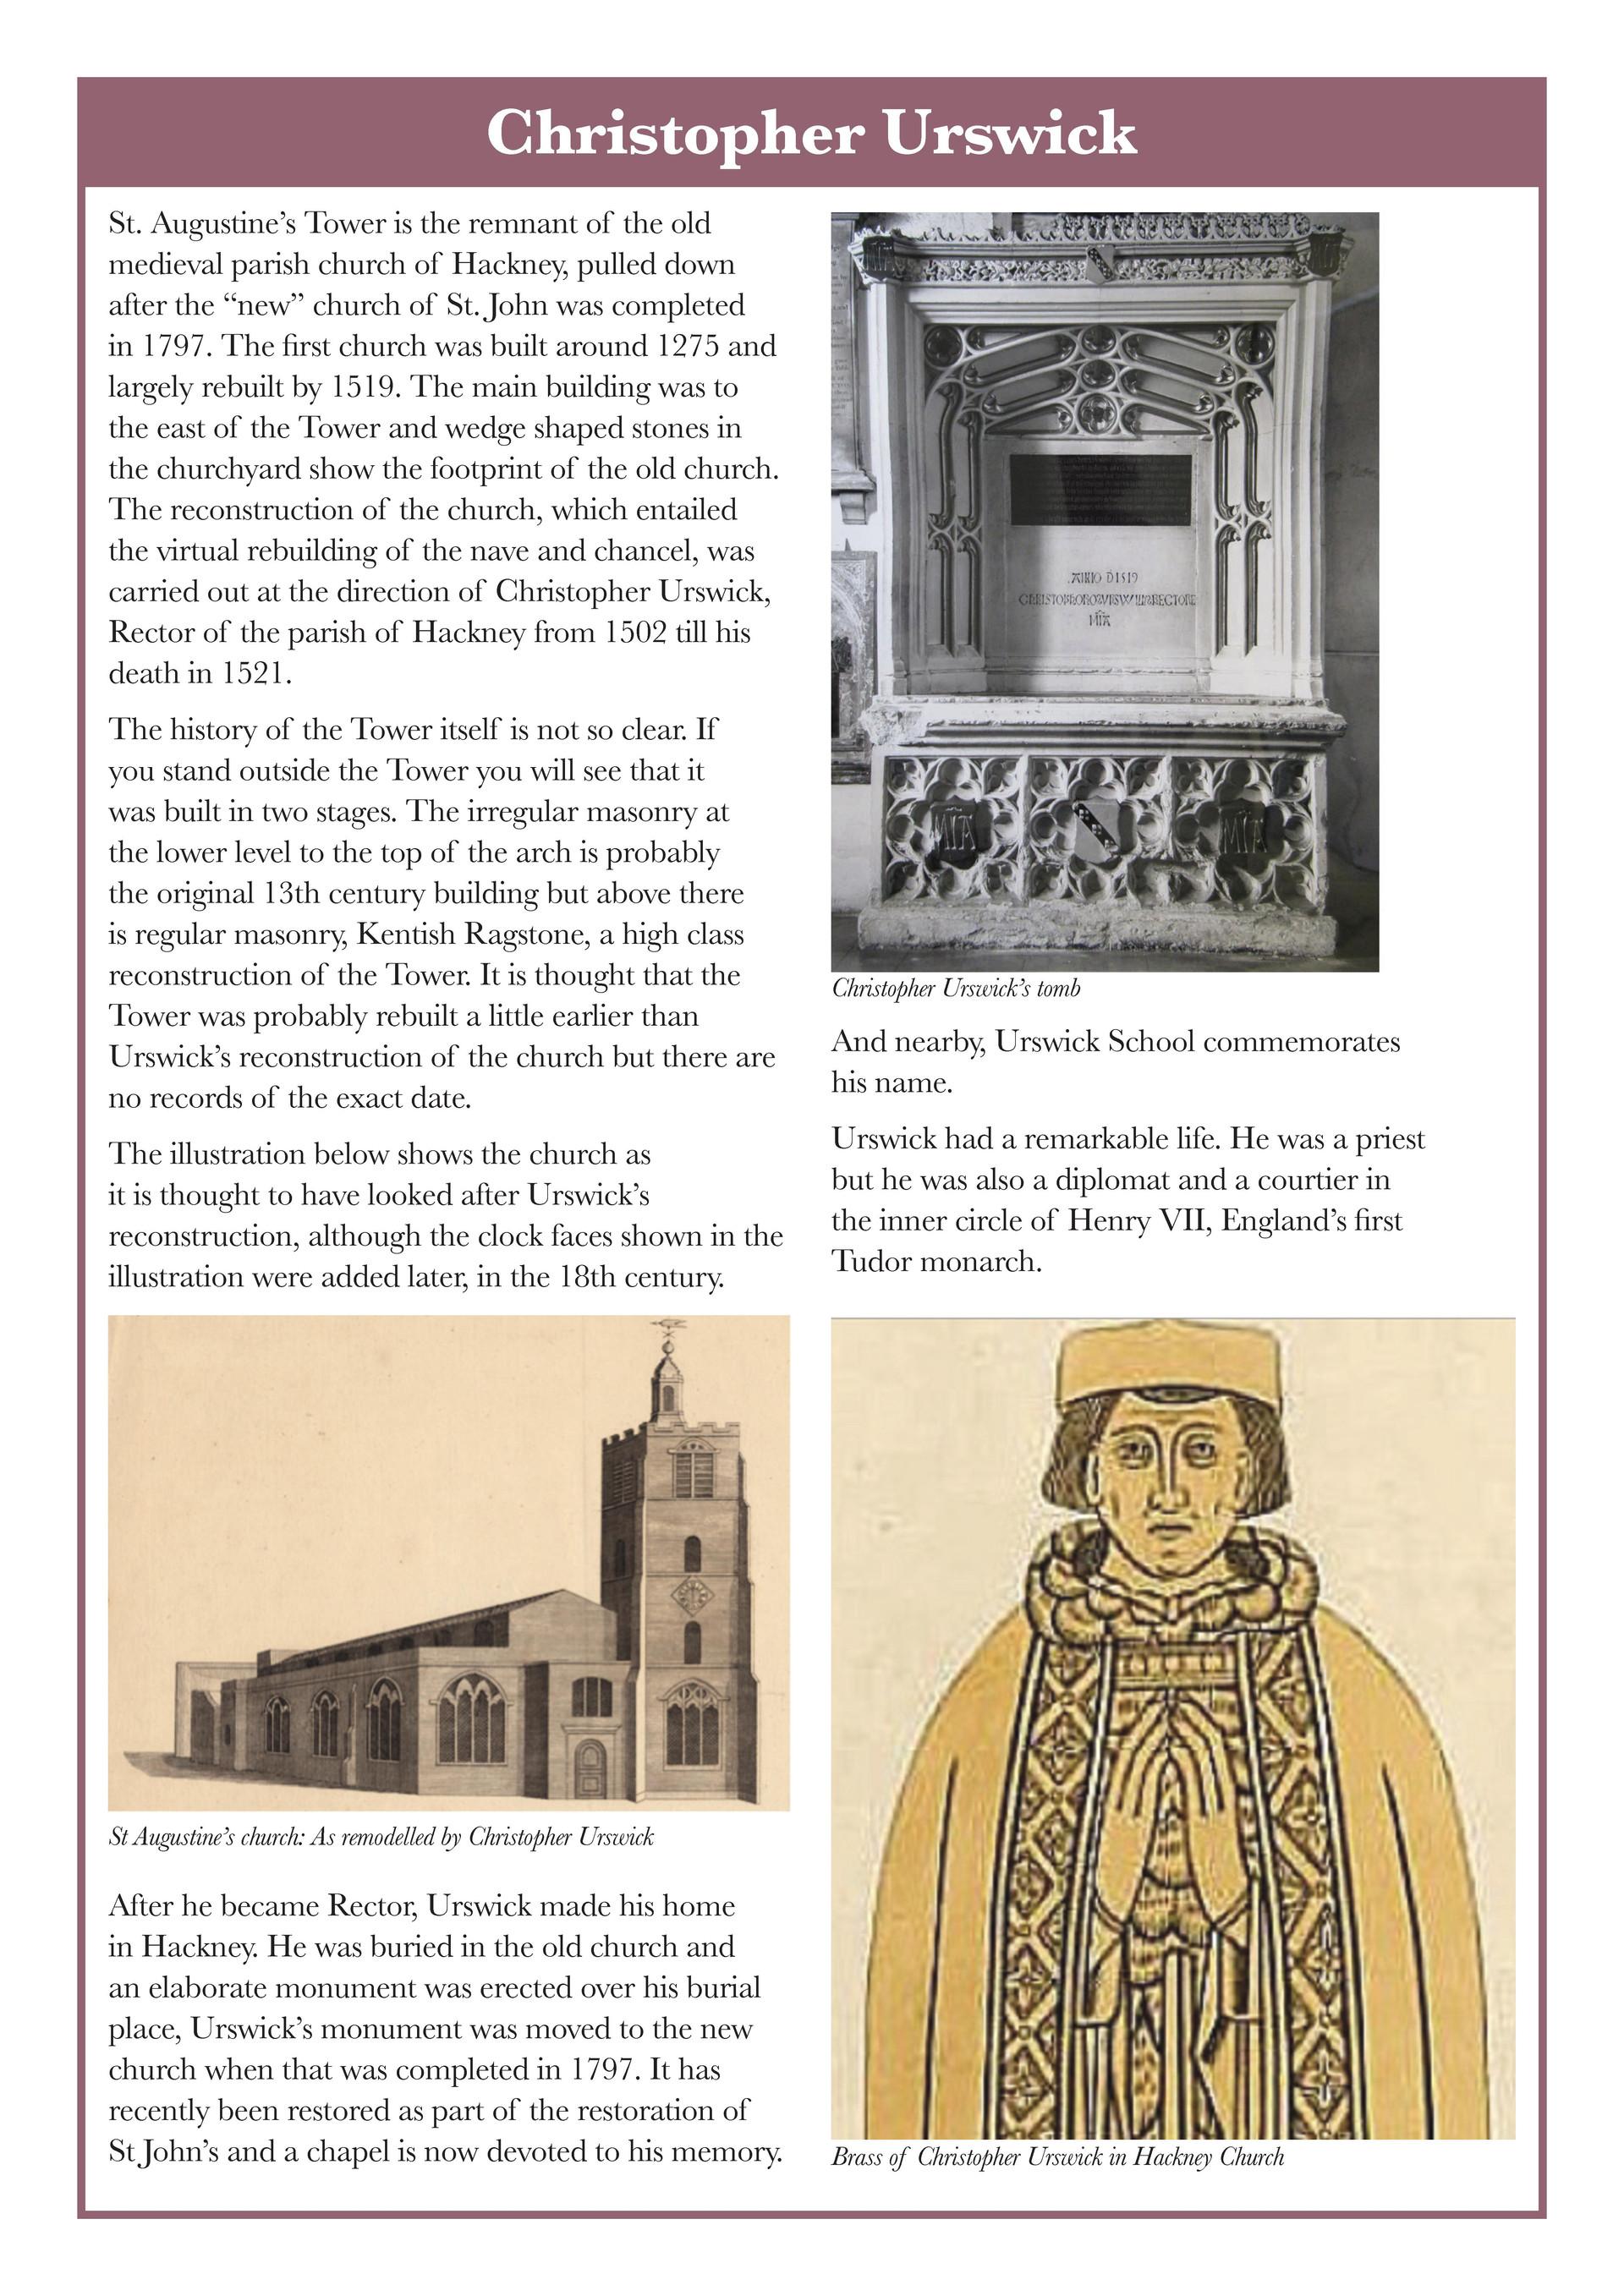 CHRISTOPHER URSWICK'S RESTORATION OF ST. AUGUSTINE'S CHUCH /1